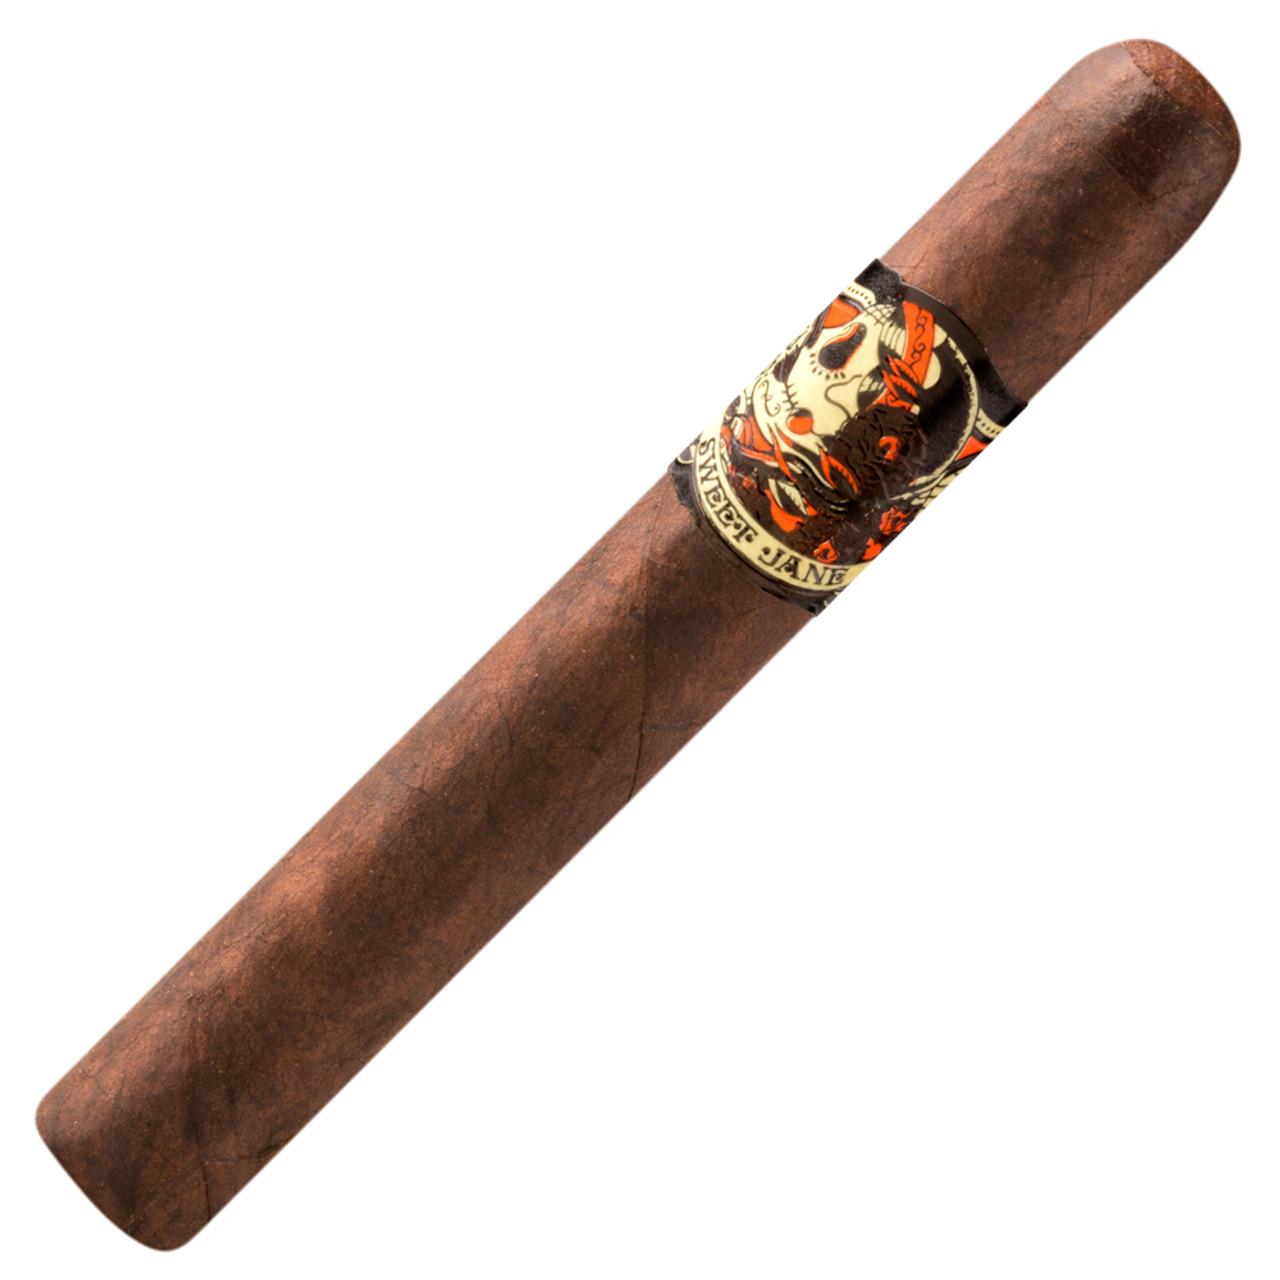 Deadwood Tobacco Sweet Jane Maduro Cigars - 5 x 46 (Box of 24)